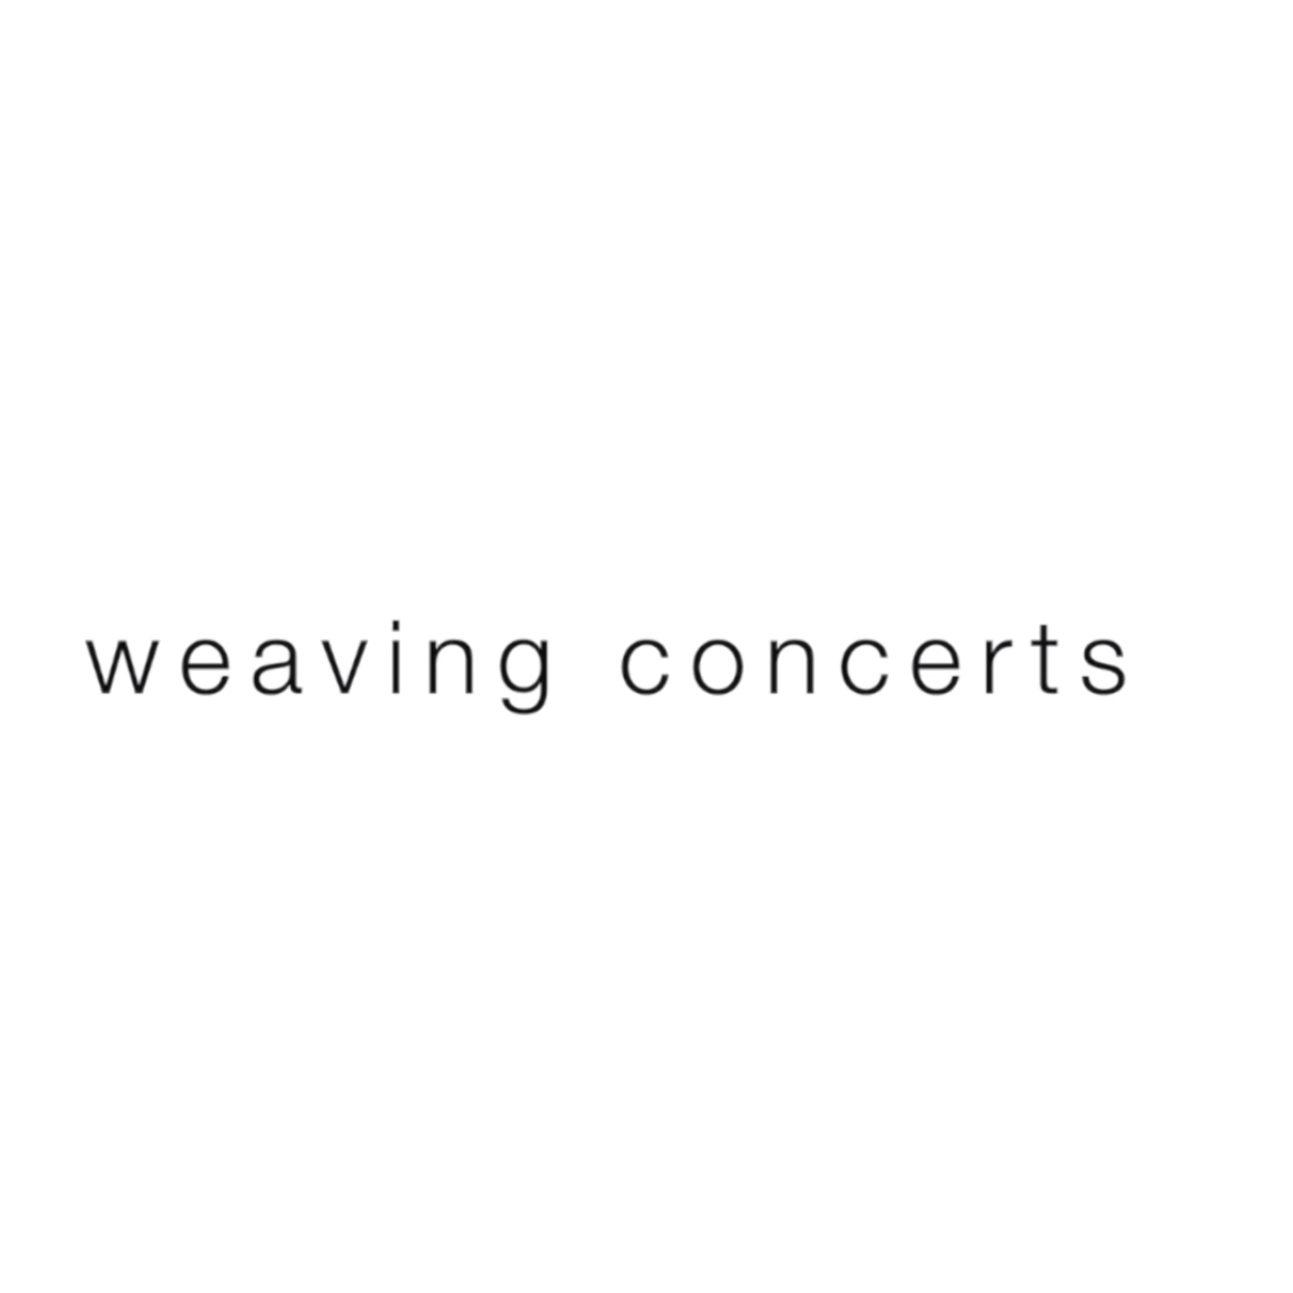 Weaving Concerts